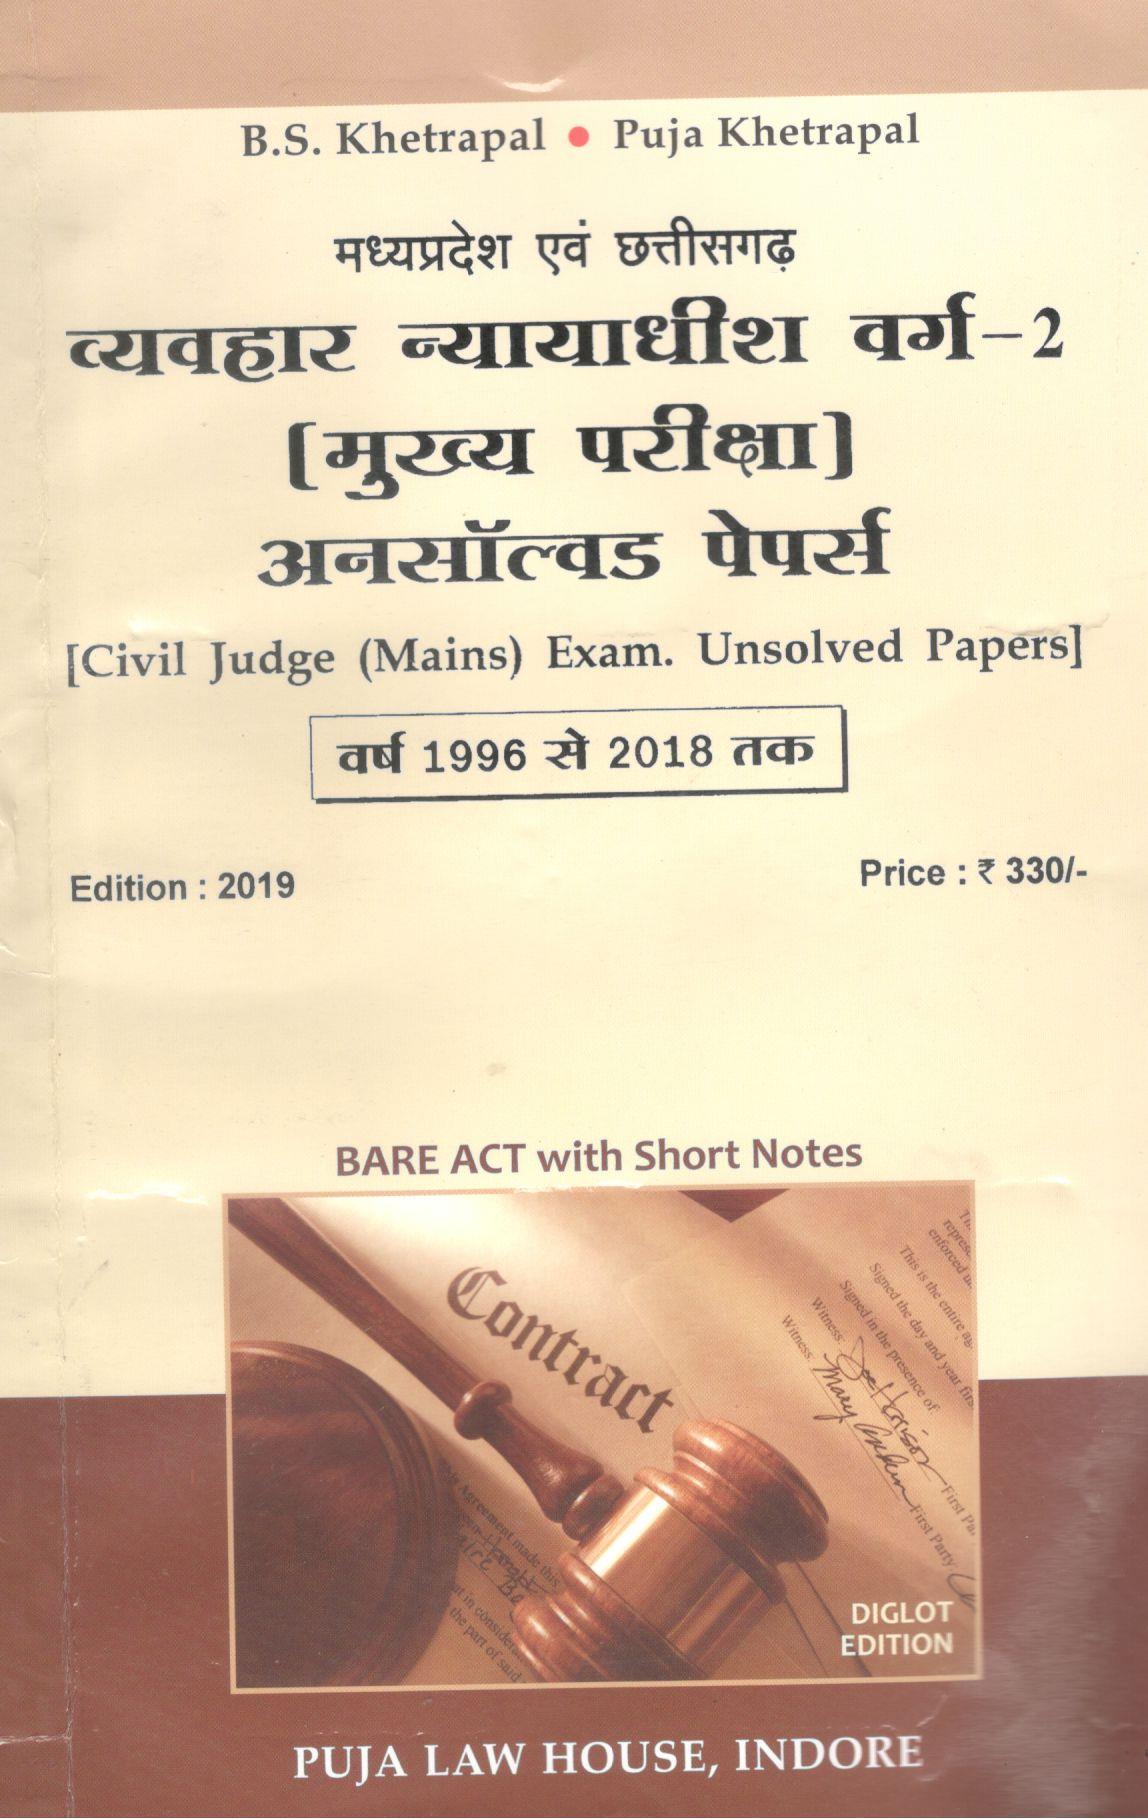 भीमसेन खेत्रपाल – मध्य प्रदेश/छत्तीसगढ़ व्यवहार न्यायाधीश (मुख्य) परीक्षा अनसॉल्वड पेपर्स / Madhya Pradesh/Chhattisgarh Civil Judge (Mains) Exams Unsolved Papers(1996-2016)